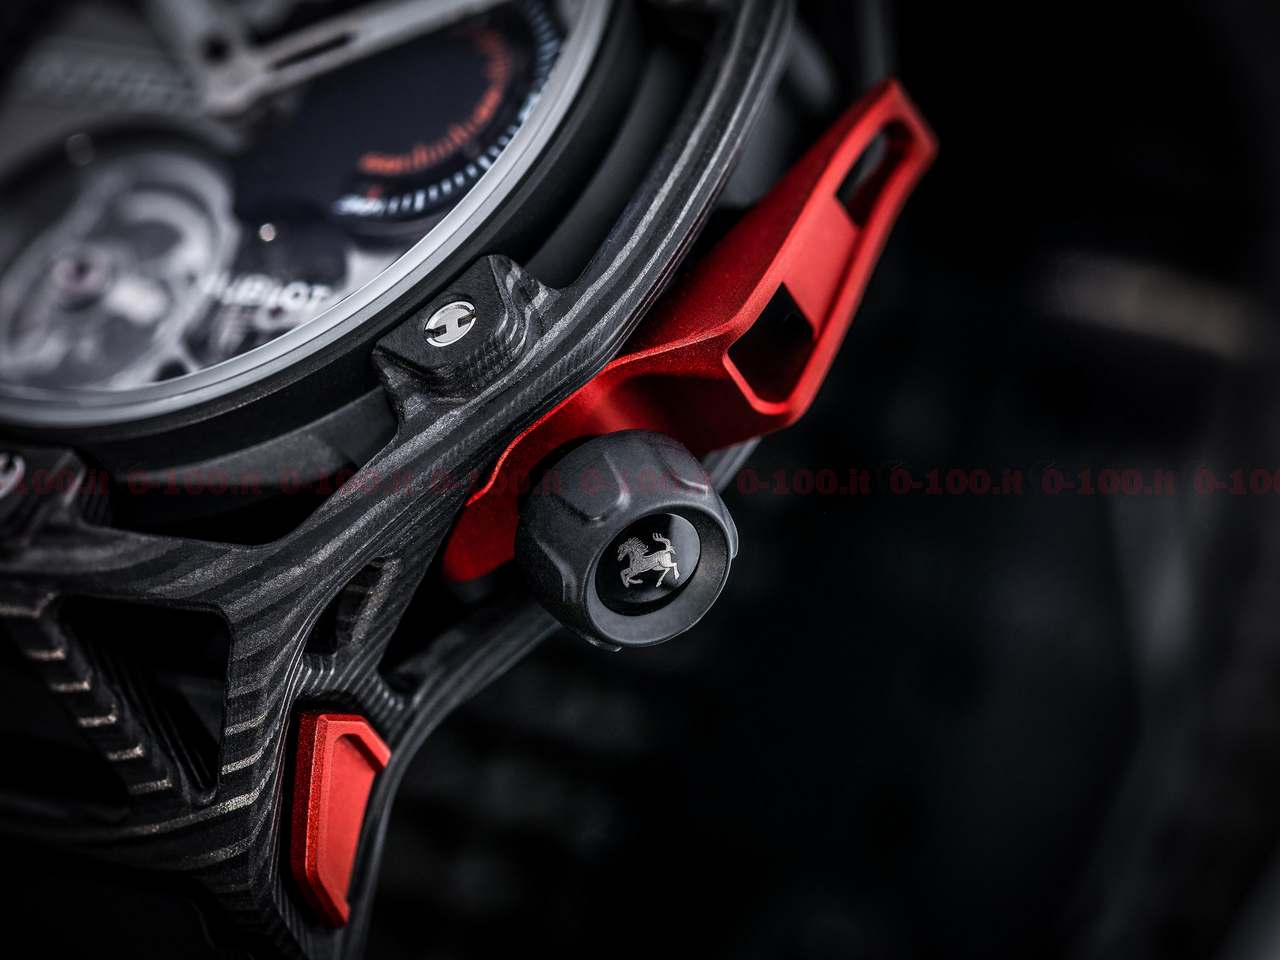 Hublot Techframe Ferrari 70 Years Tourbillon Chronograph Limited Edition_prezzo_price_0-1006